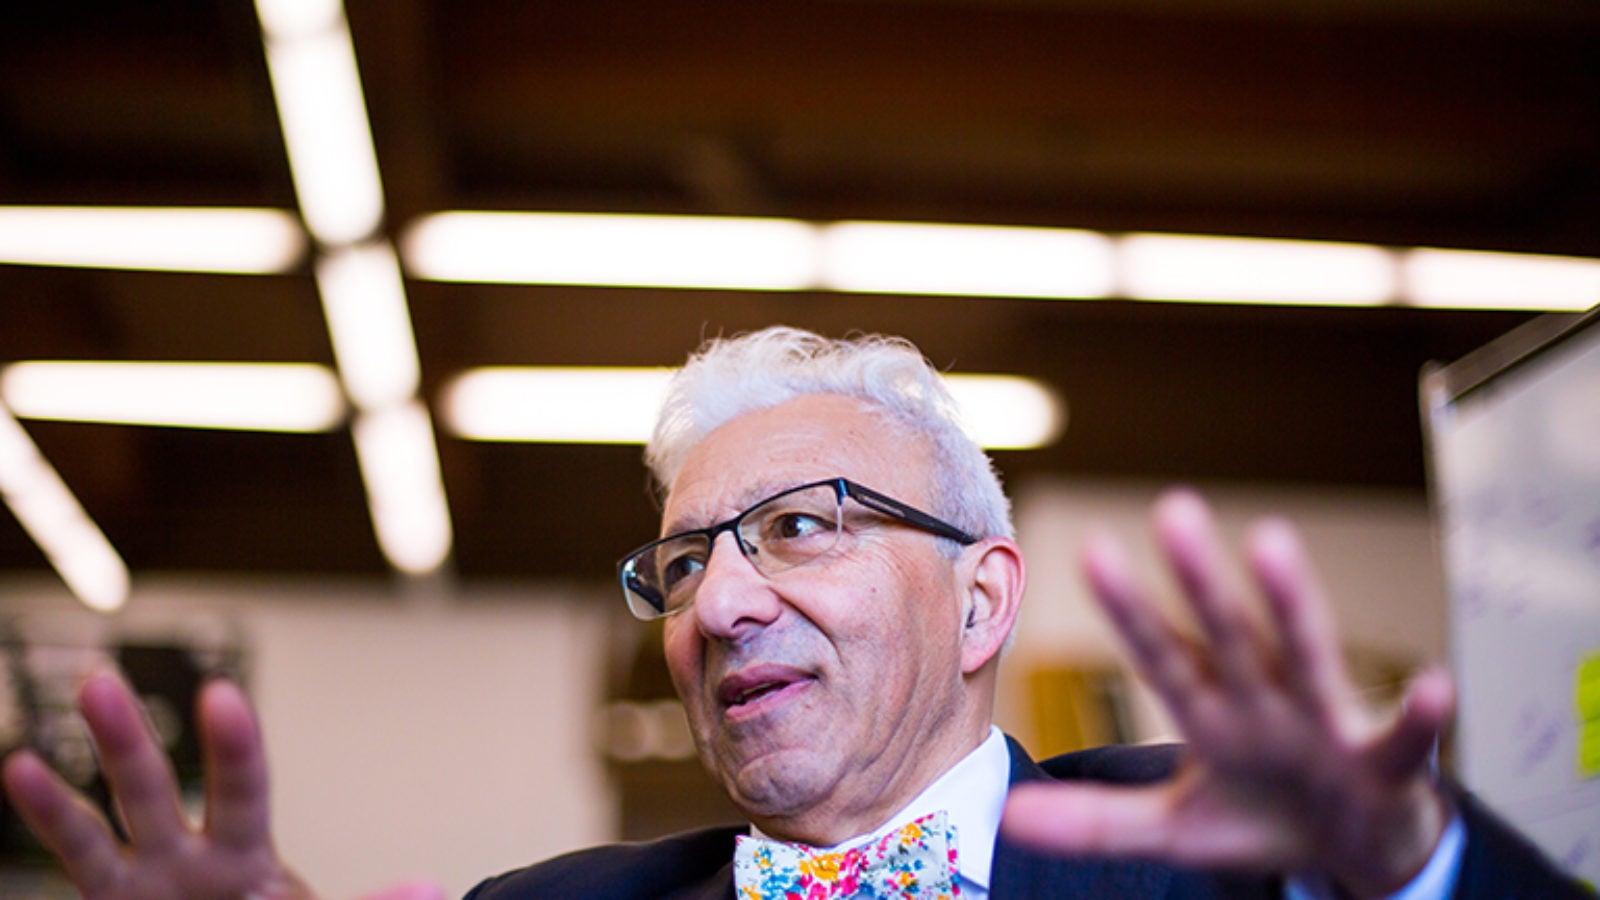 Image of Psychology professor Fathali Moghaddam speaking.